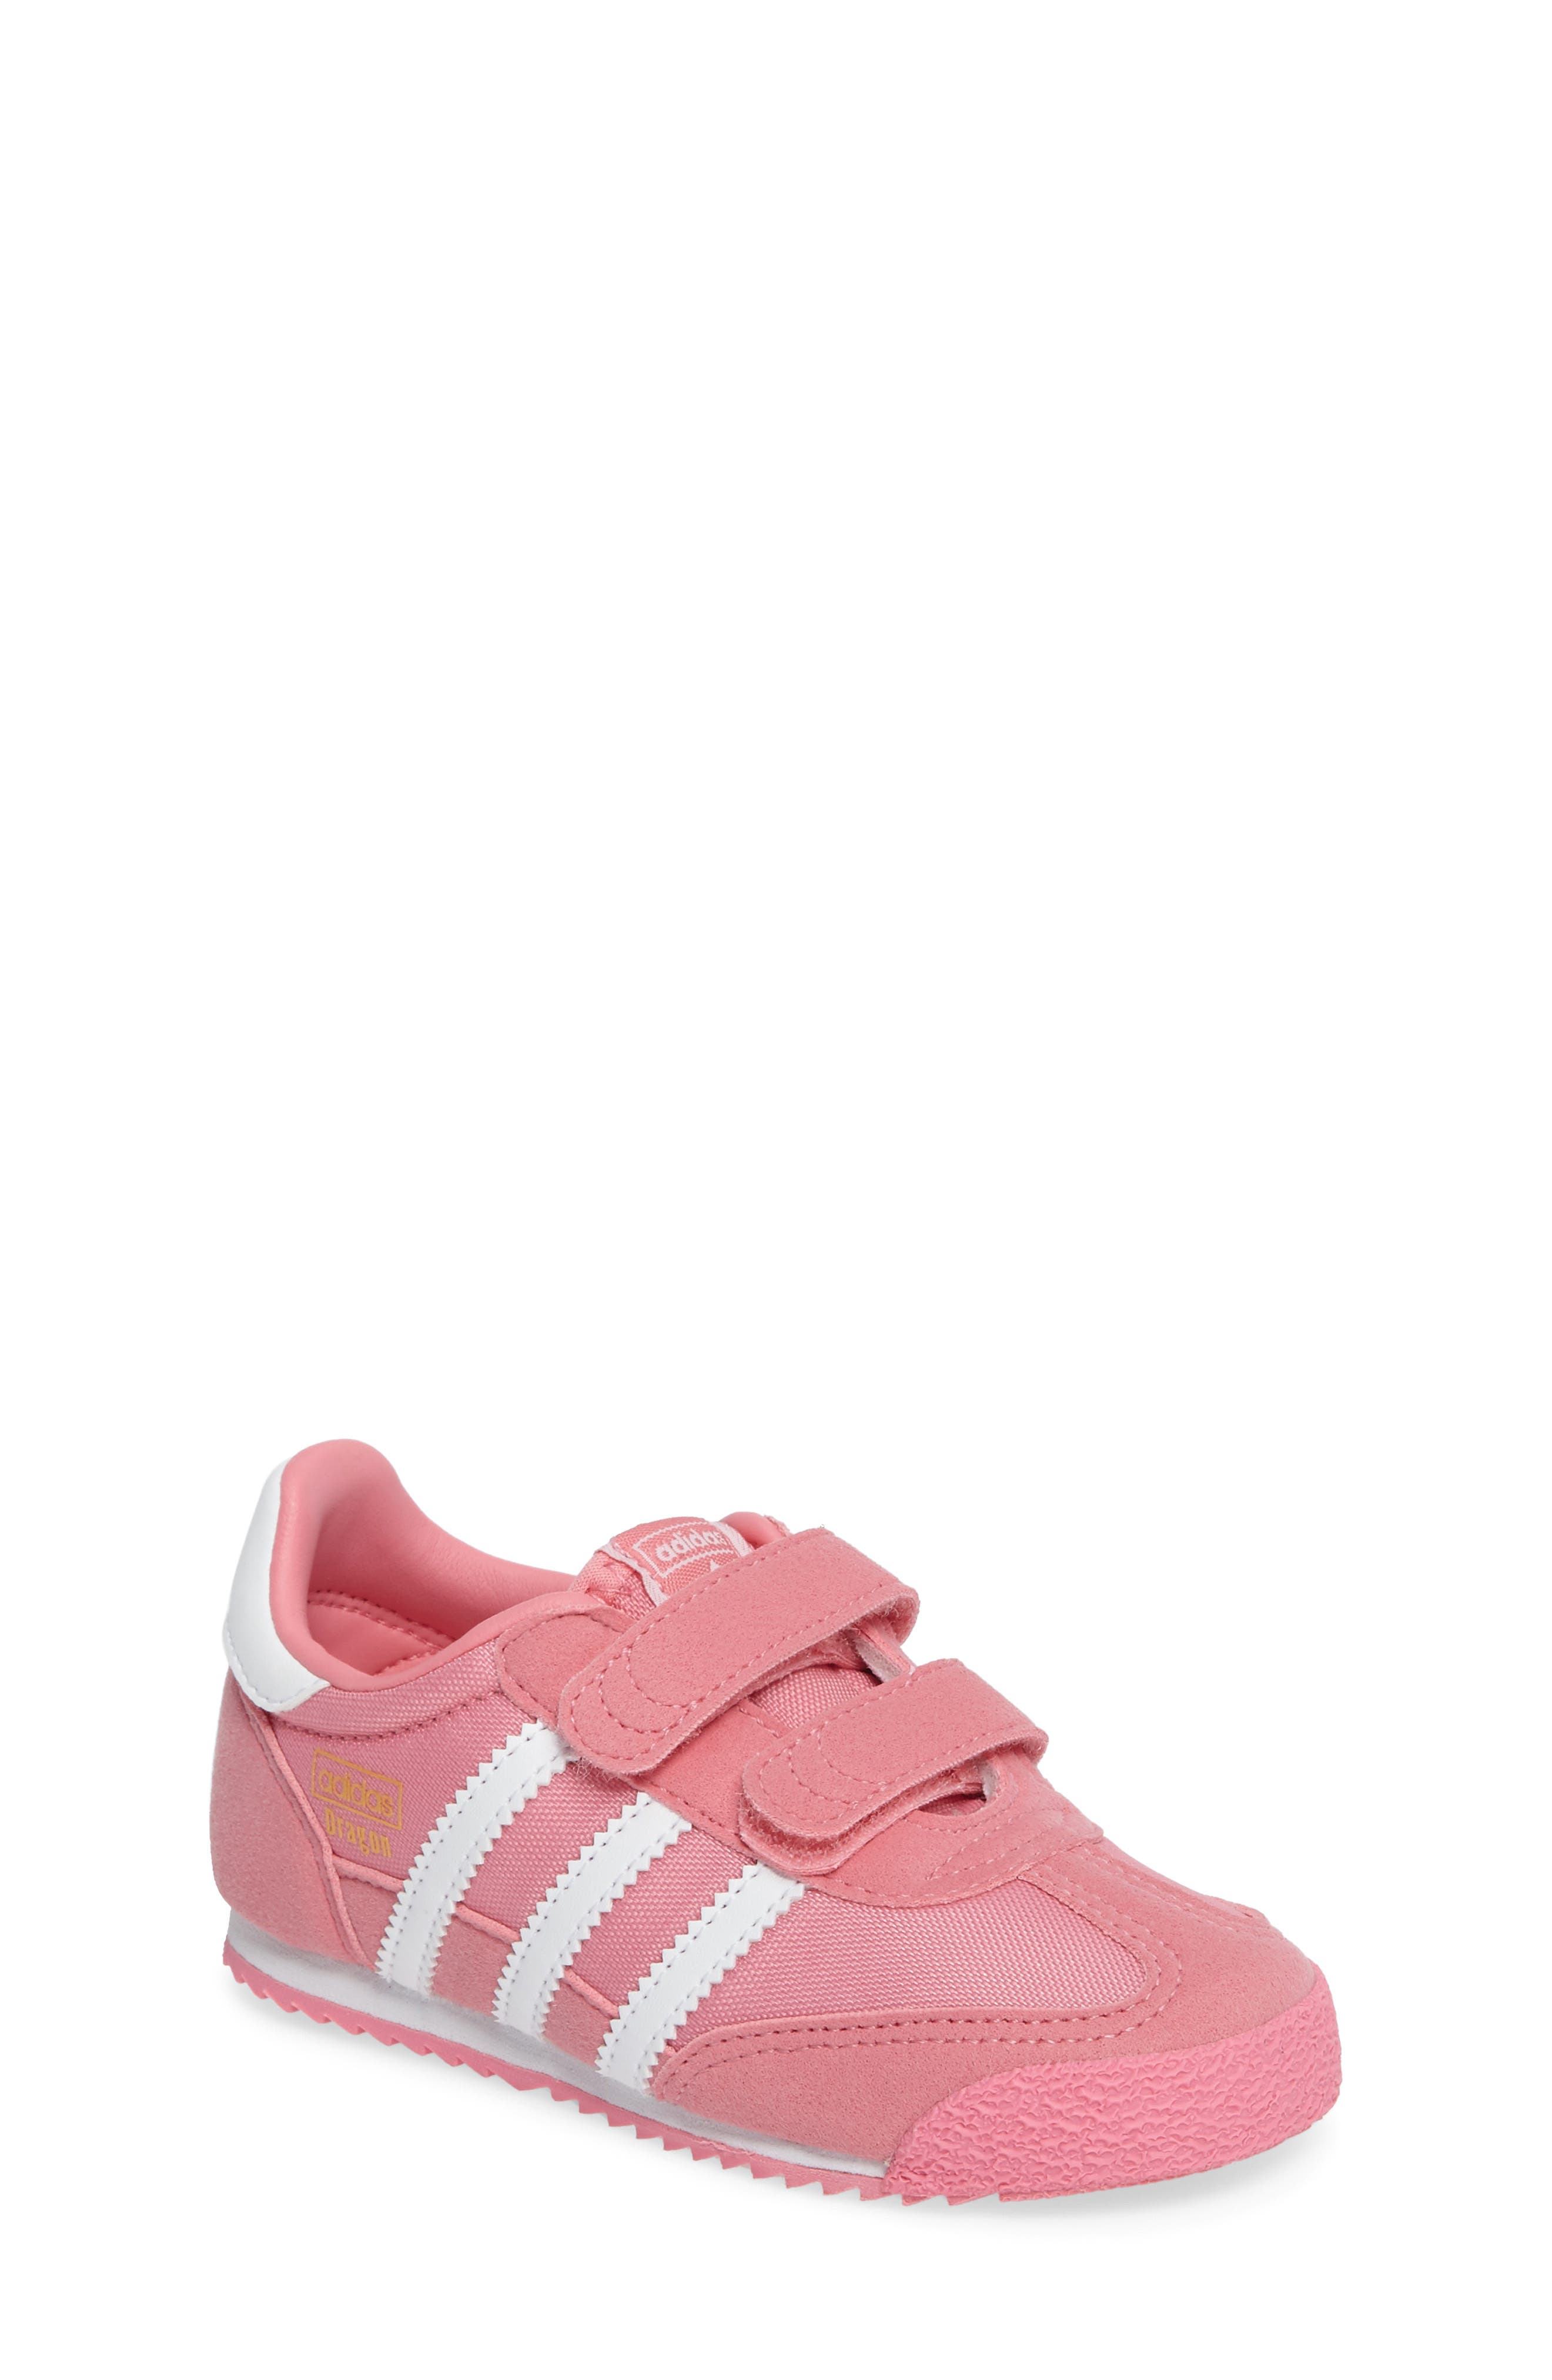 Dragon OG CF Athletic Shoe,                             Main thumbnail 1, color,